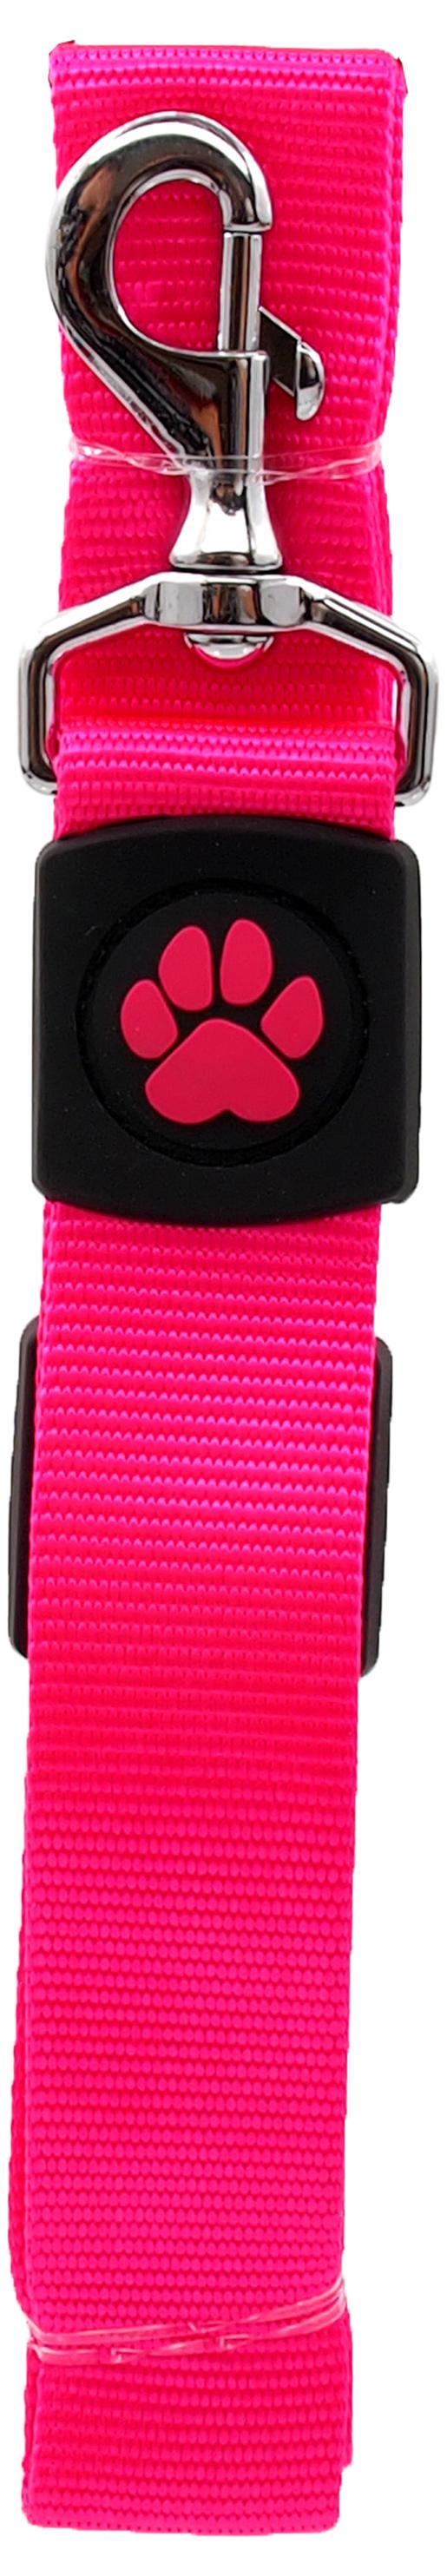 Dog Fantasy Vodítko Active Dog Premium XL růžové 3,8x120cm